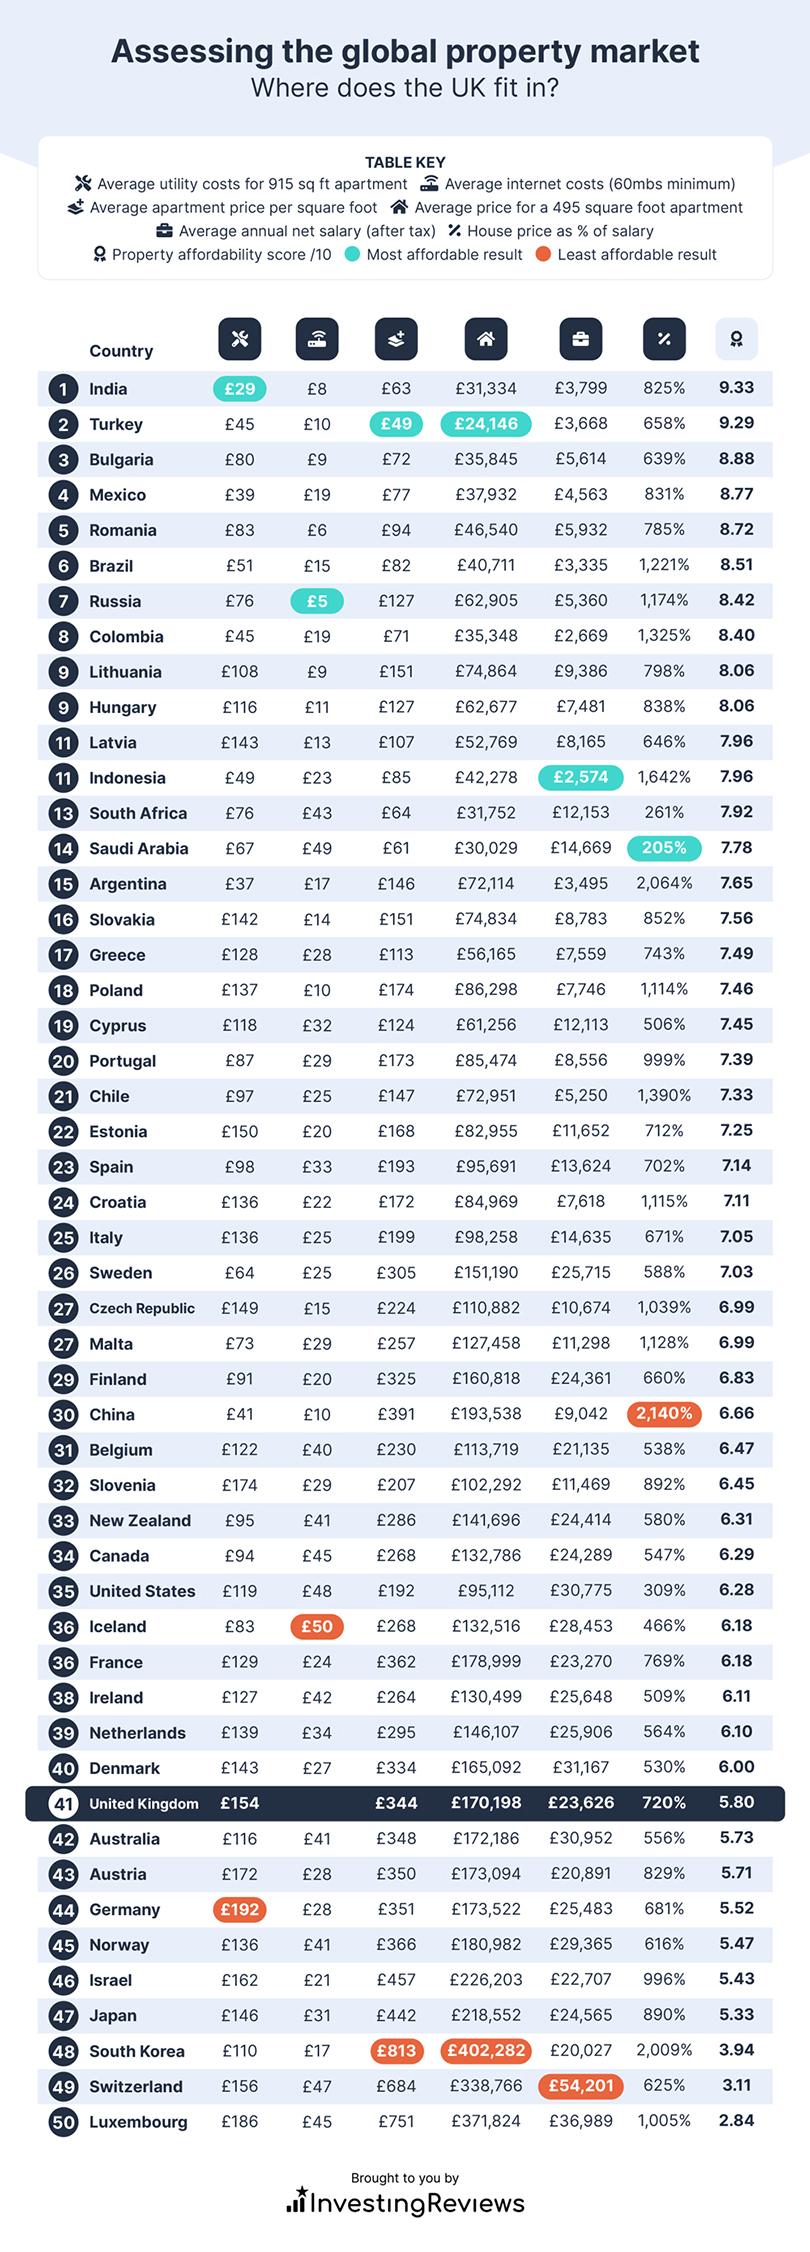 Assessing the global property market full table